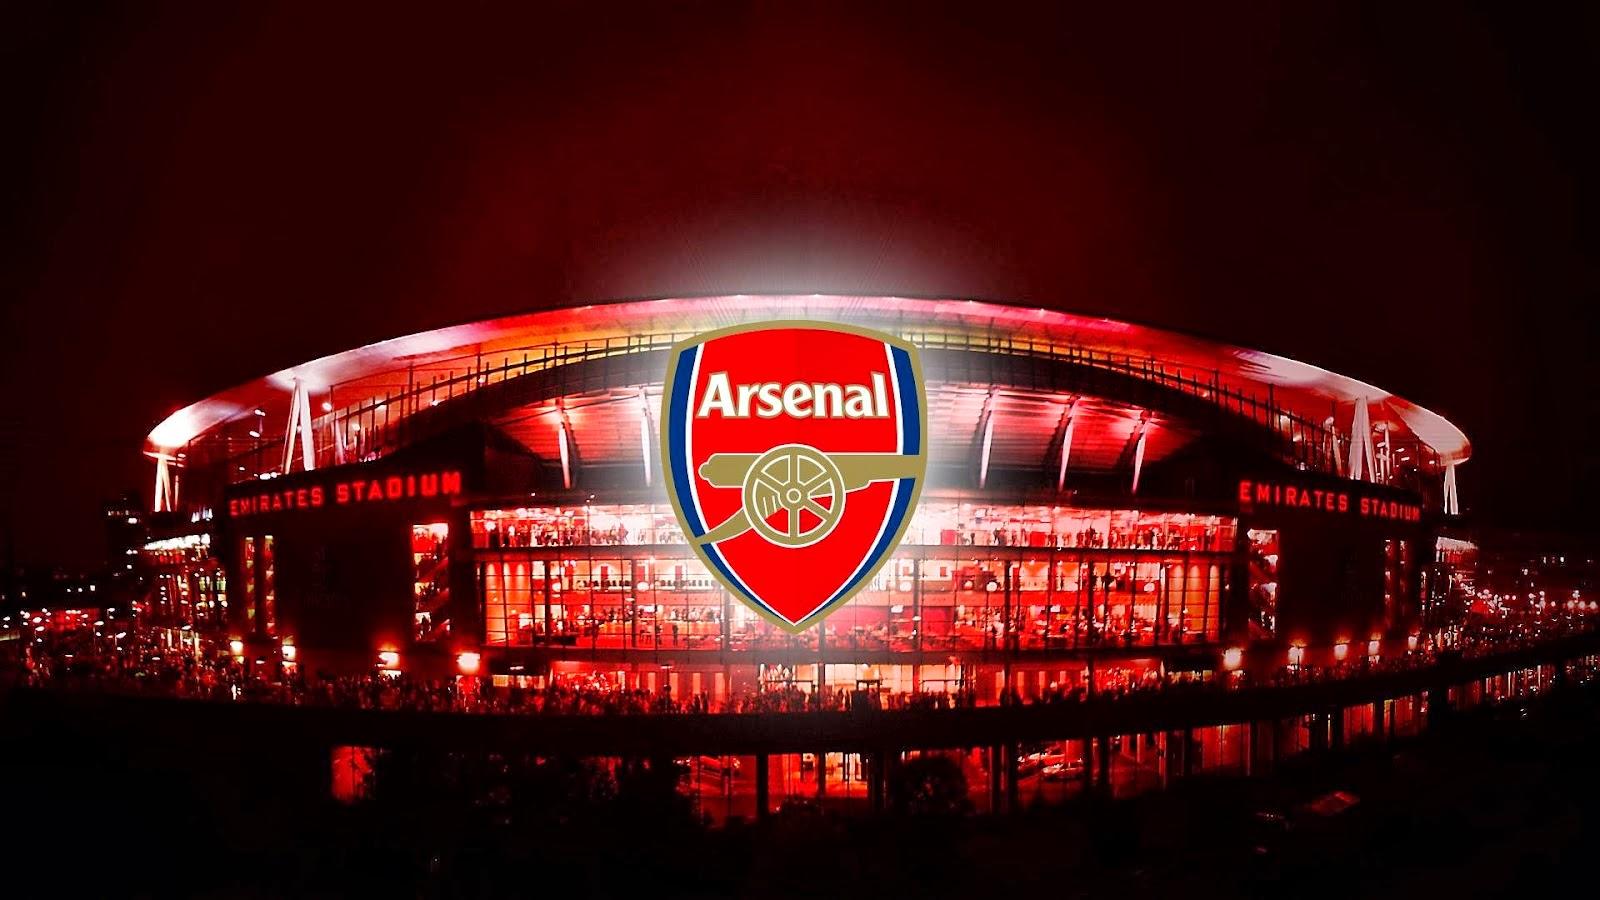 emirates stadium wallpaper hd arsenal